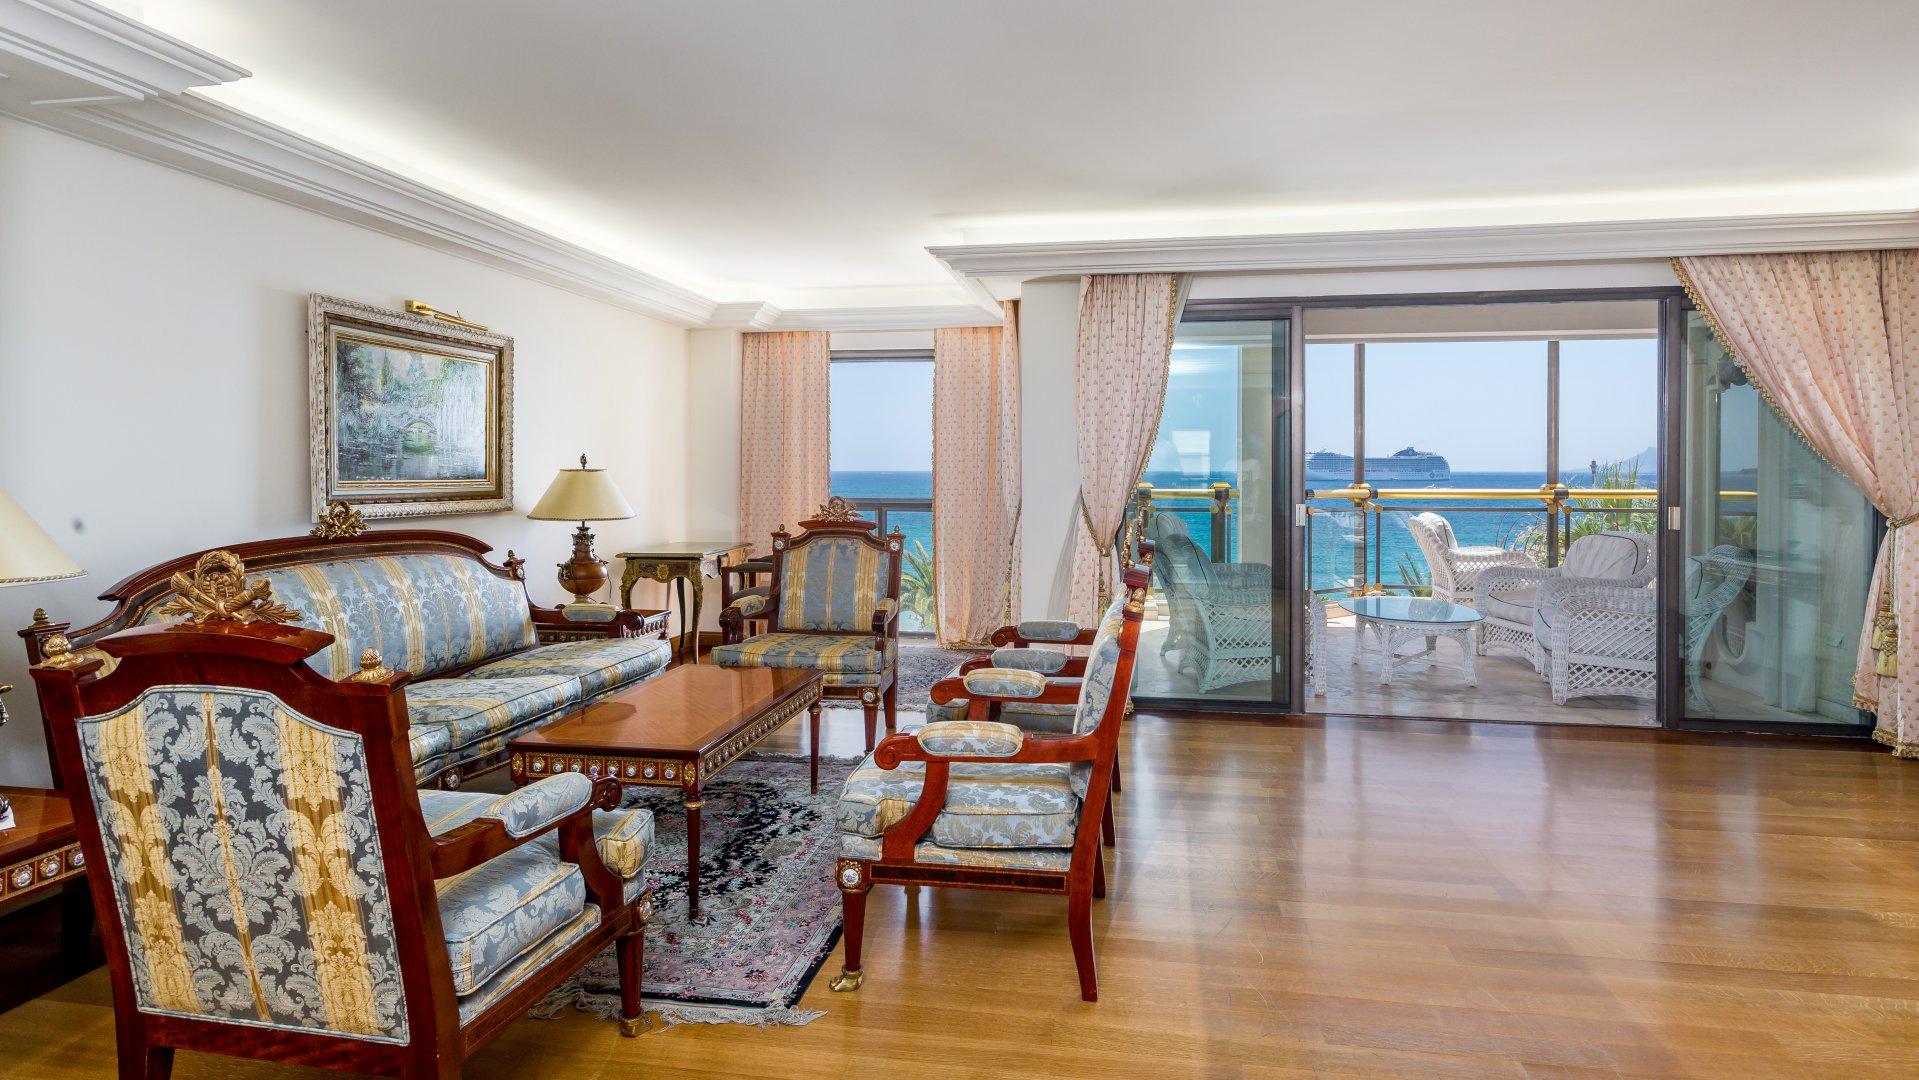 Ad Sale Apartment Cannes Croisette 06400 3 Rooms V4425ca